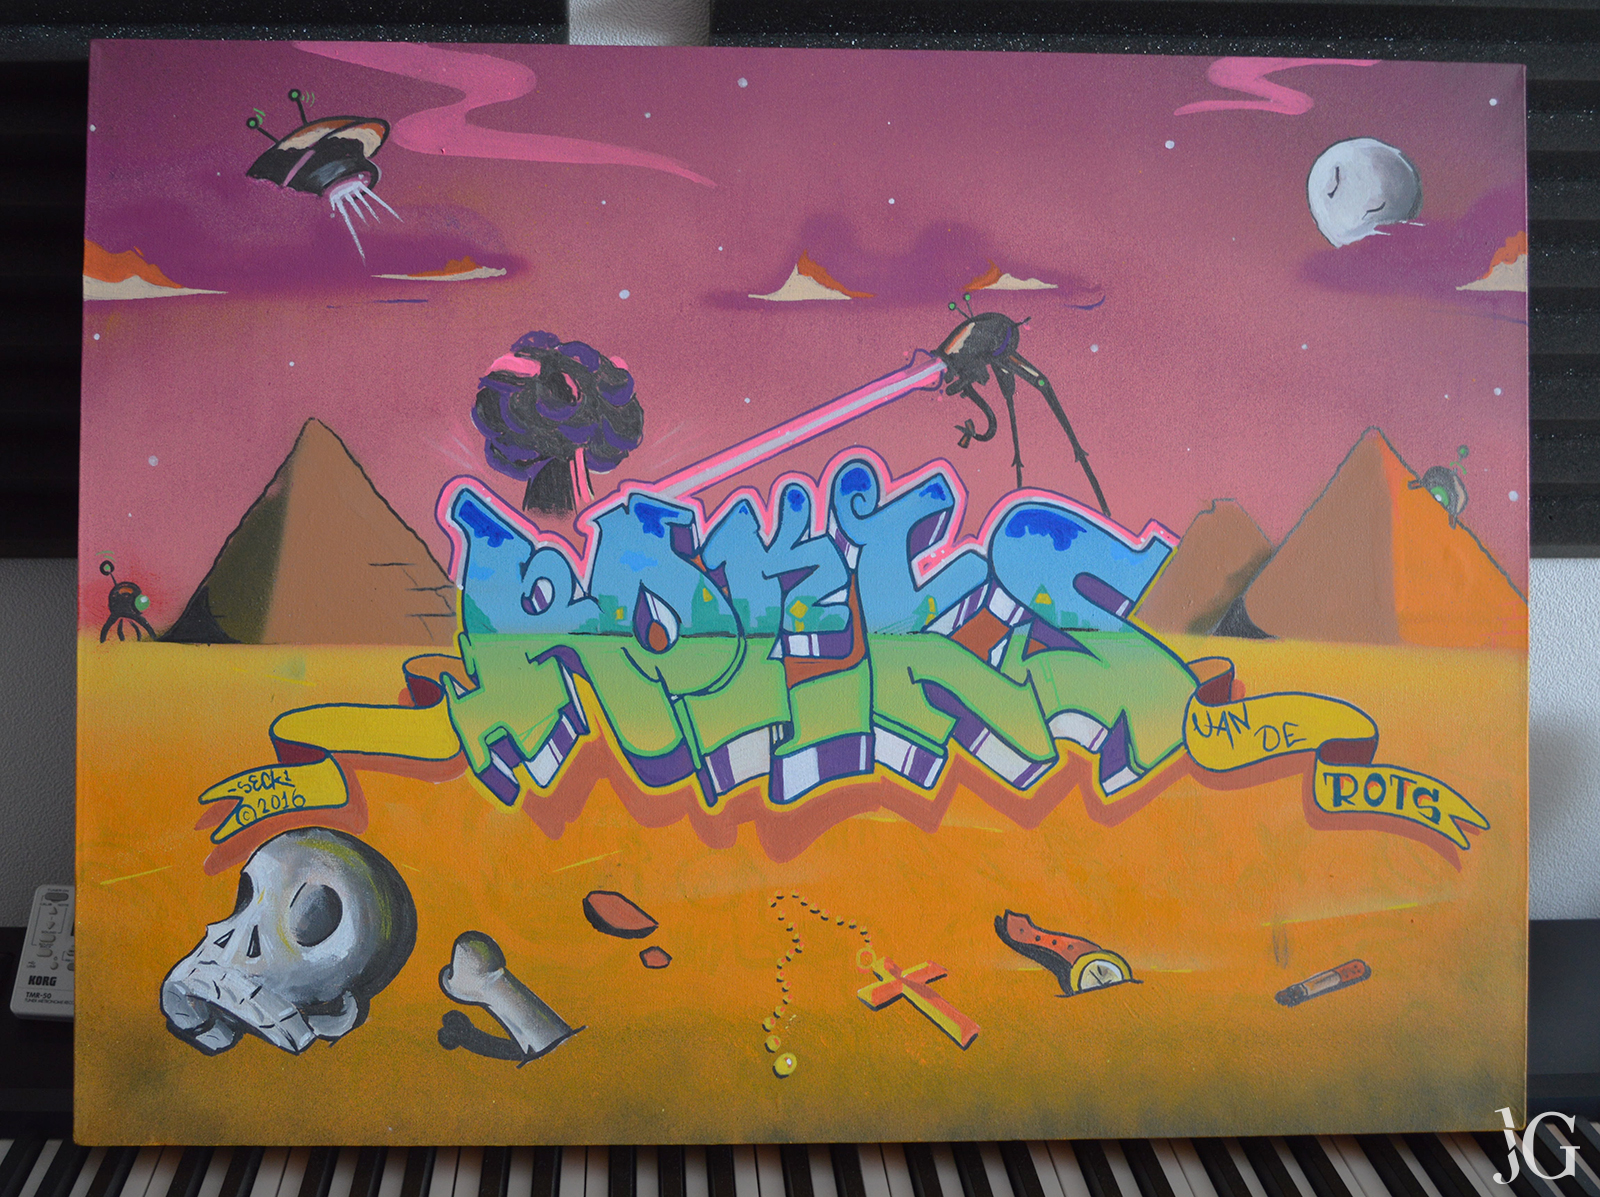 Custom Graffiti Canvas Painting For Rocks Van De Rots